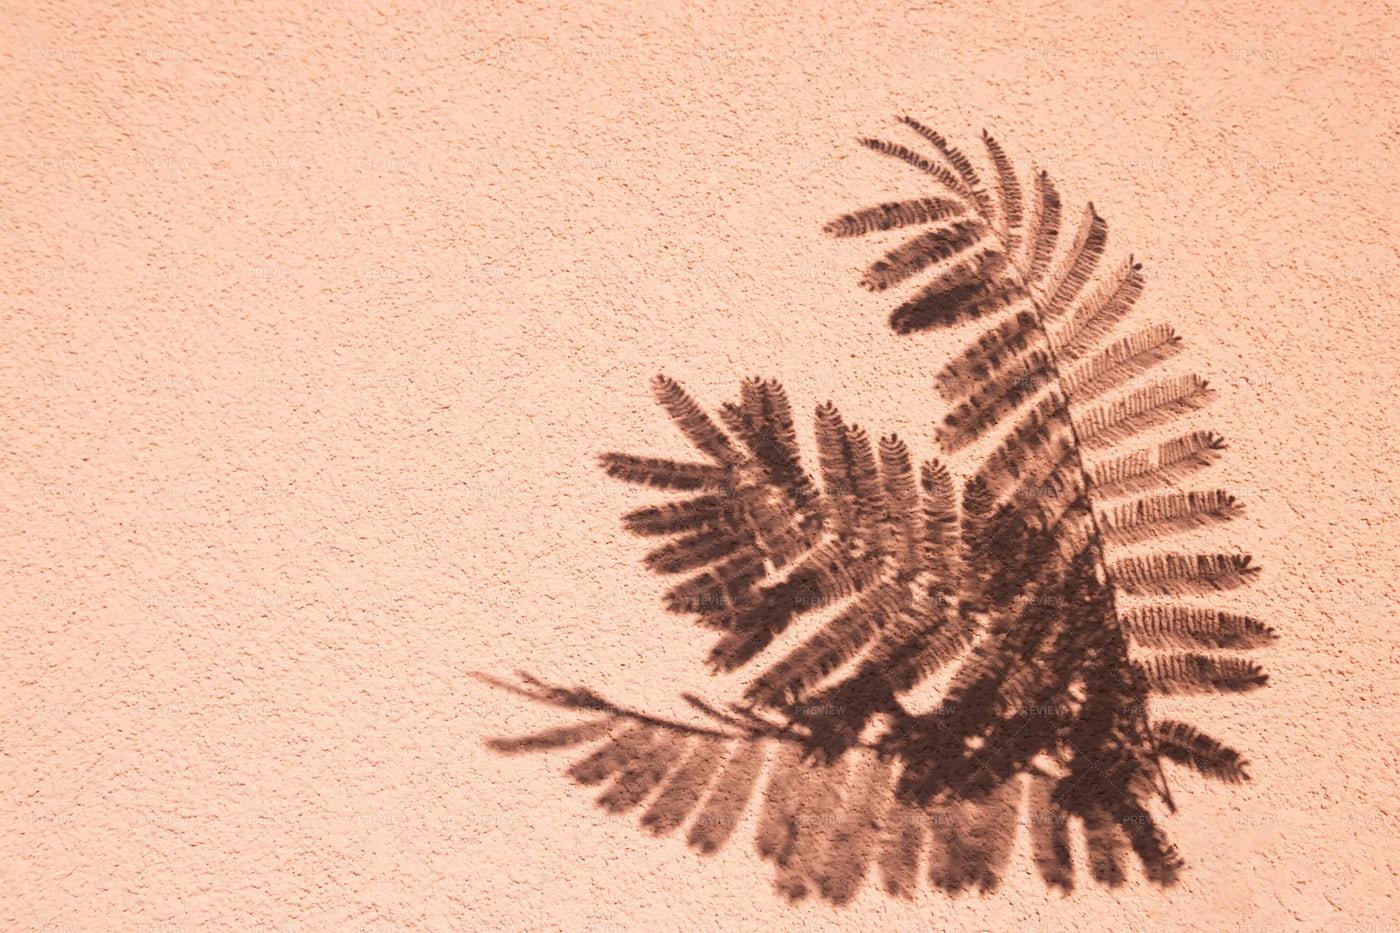 Fern Shadows On Stucco Wall: Stock Photos